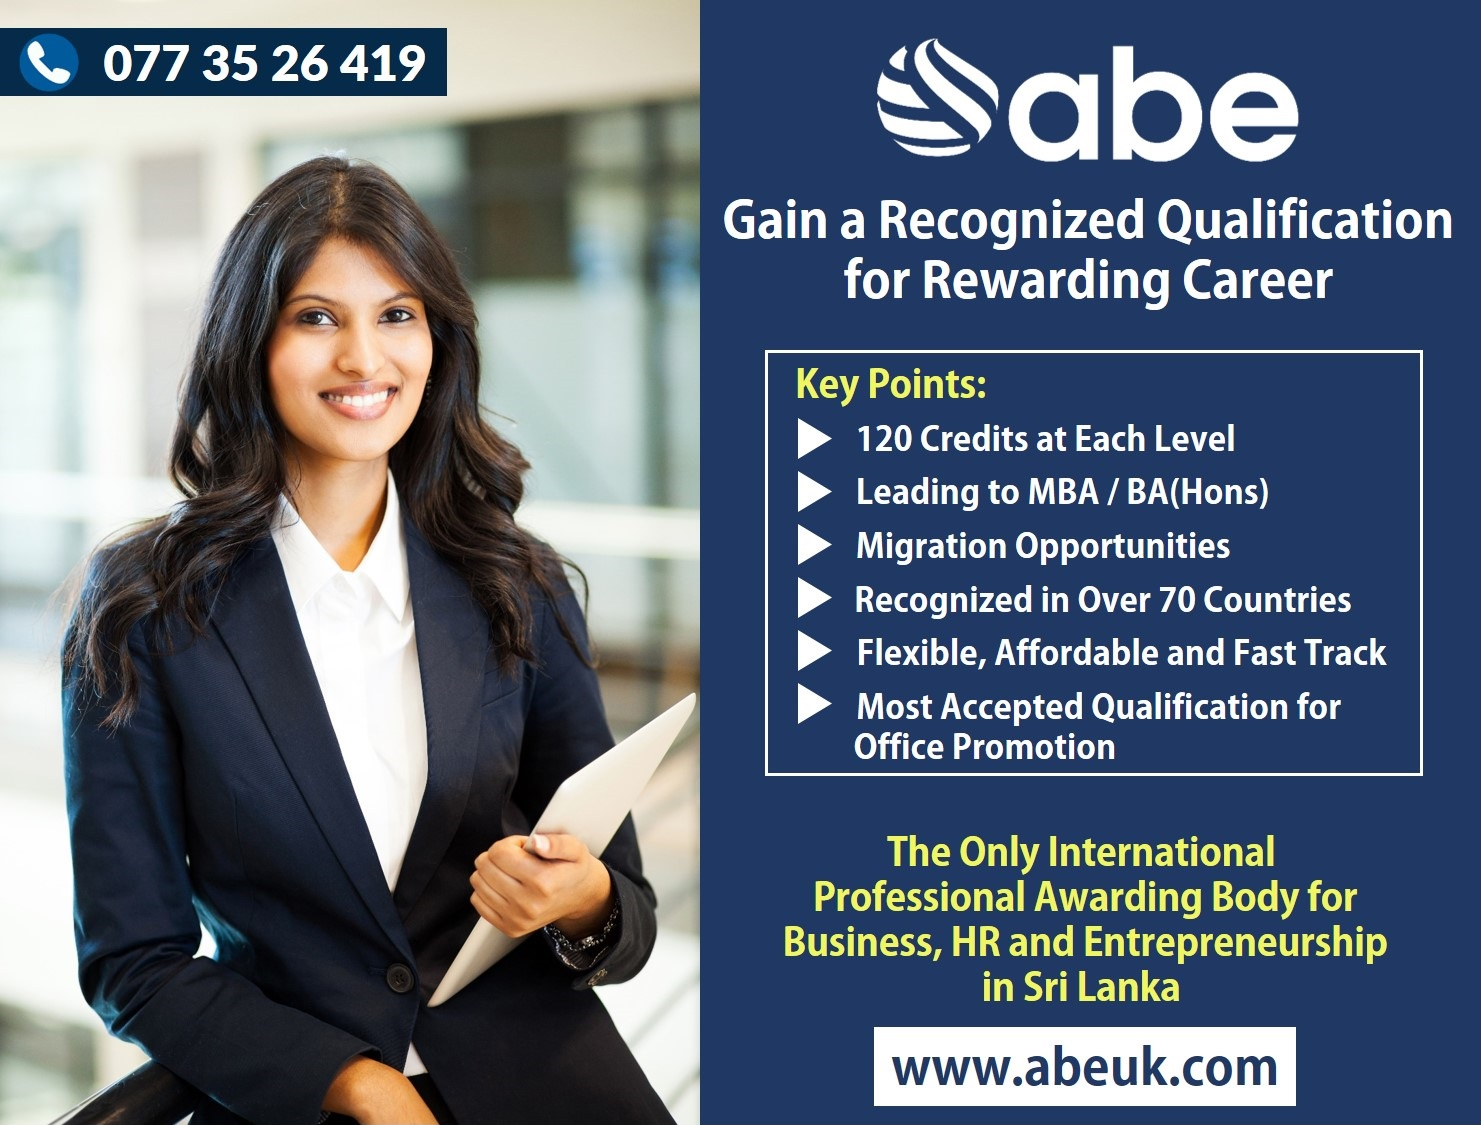 www.abeuk.com